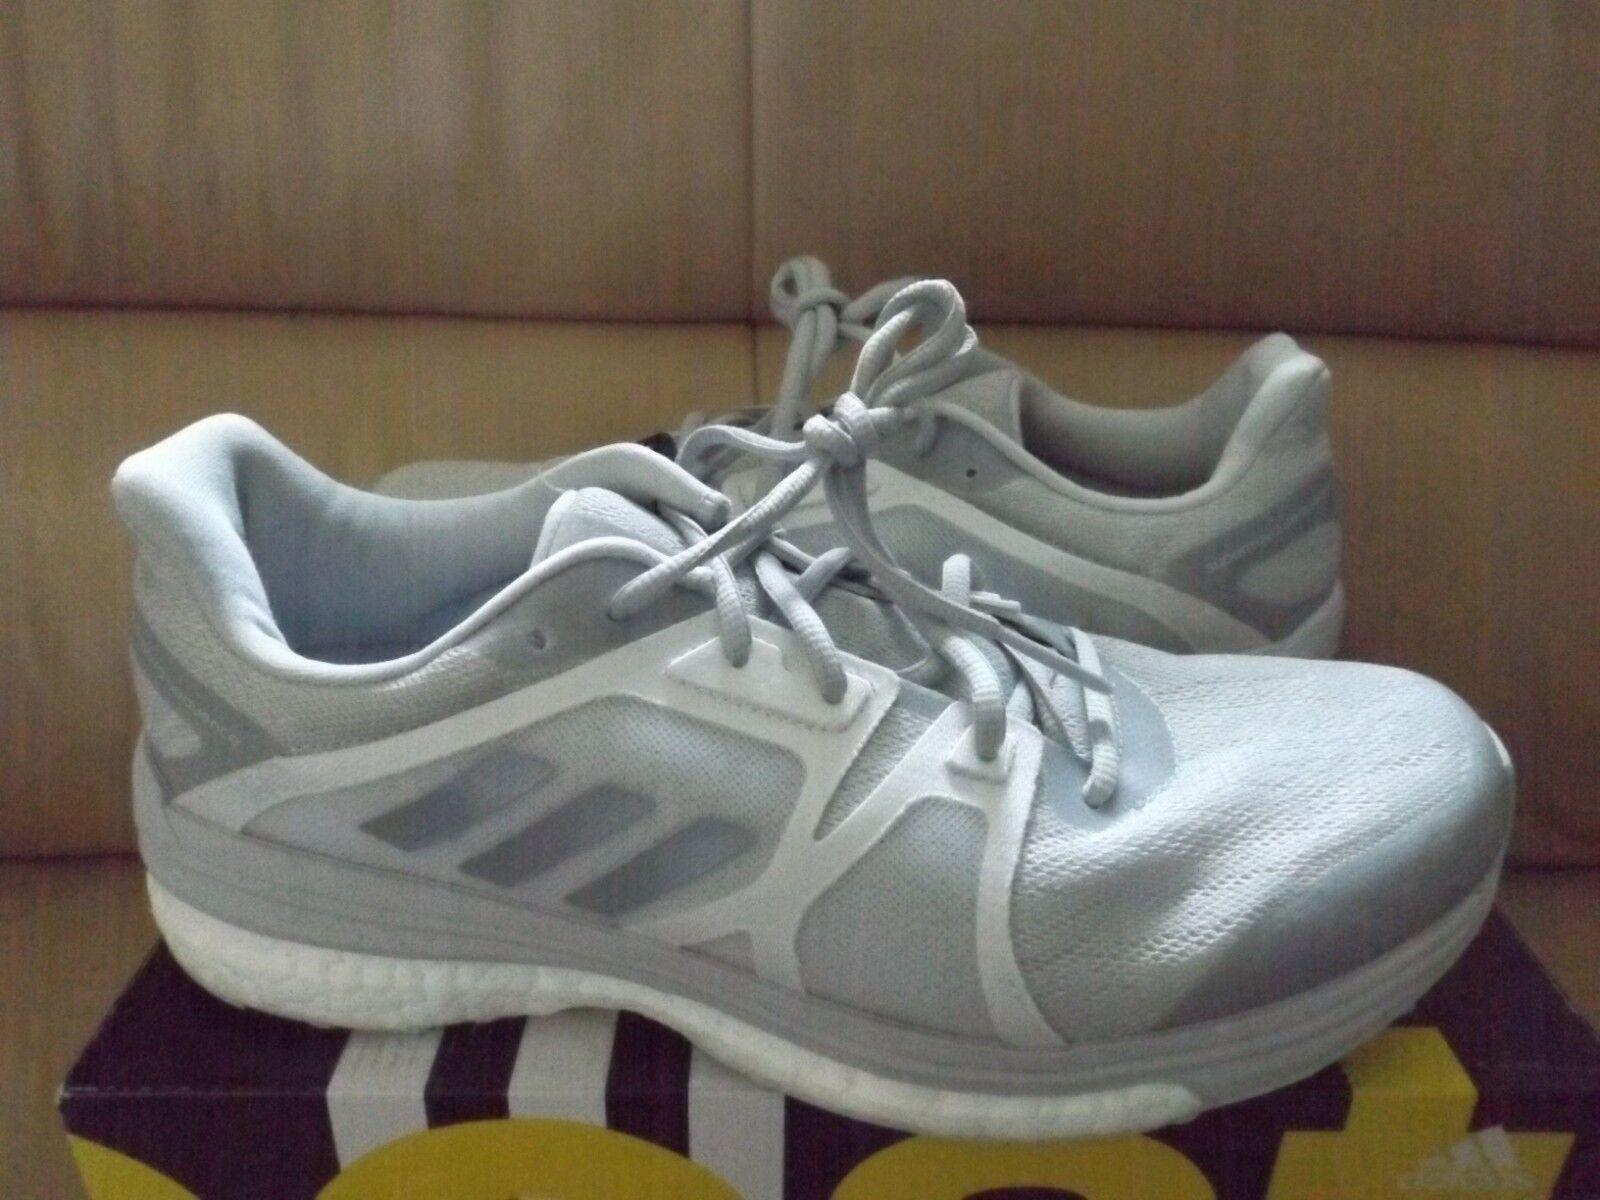 Adidas Boost Supernova Sequence 9 Women's Running shoes Solid Grey Matte AQ3552